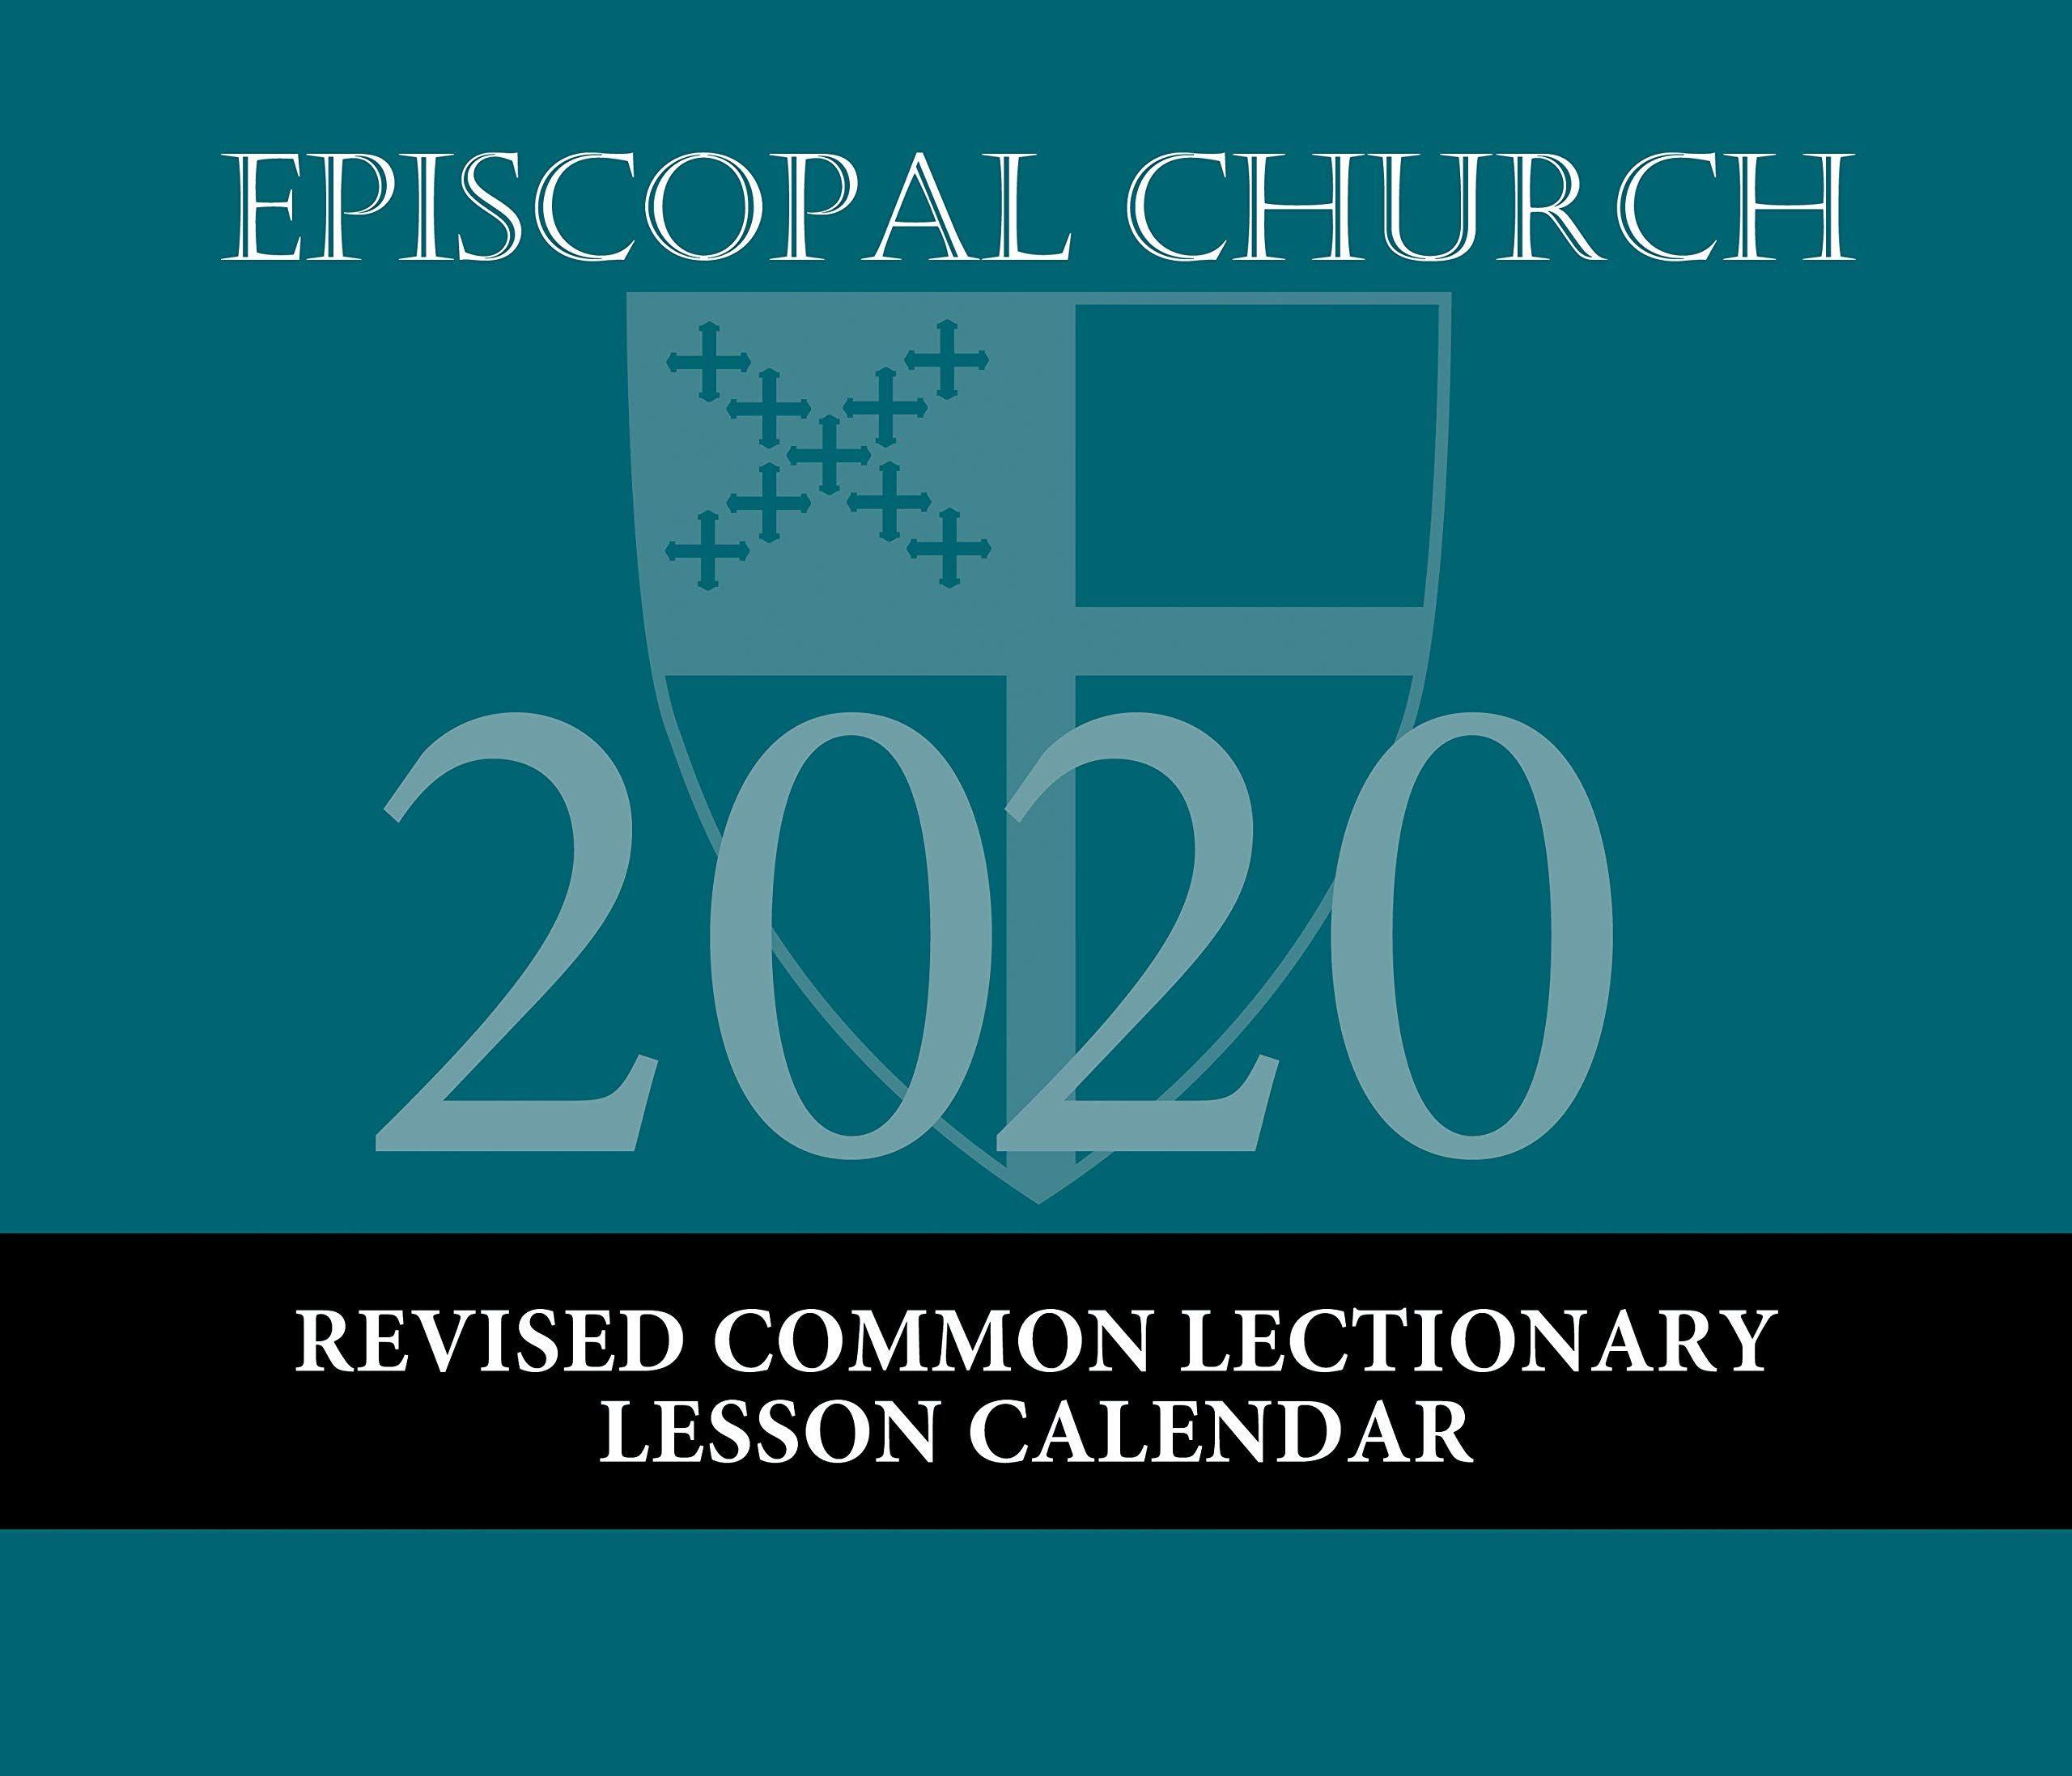 Episcopal Church Calendar 2020 Episcopal Church Lesson Calendar RCL 2020: December 2019 to